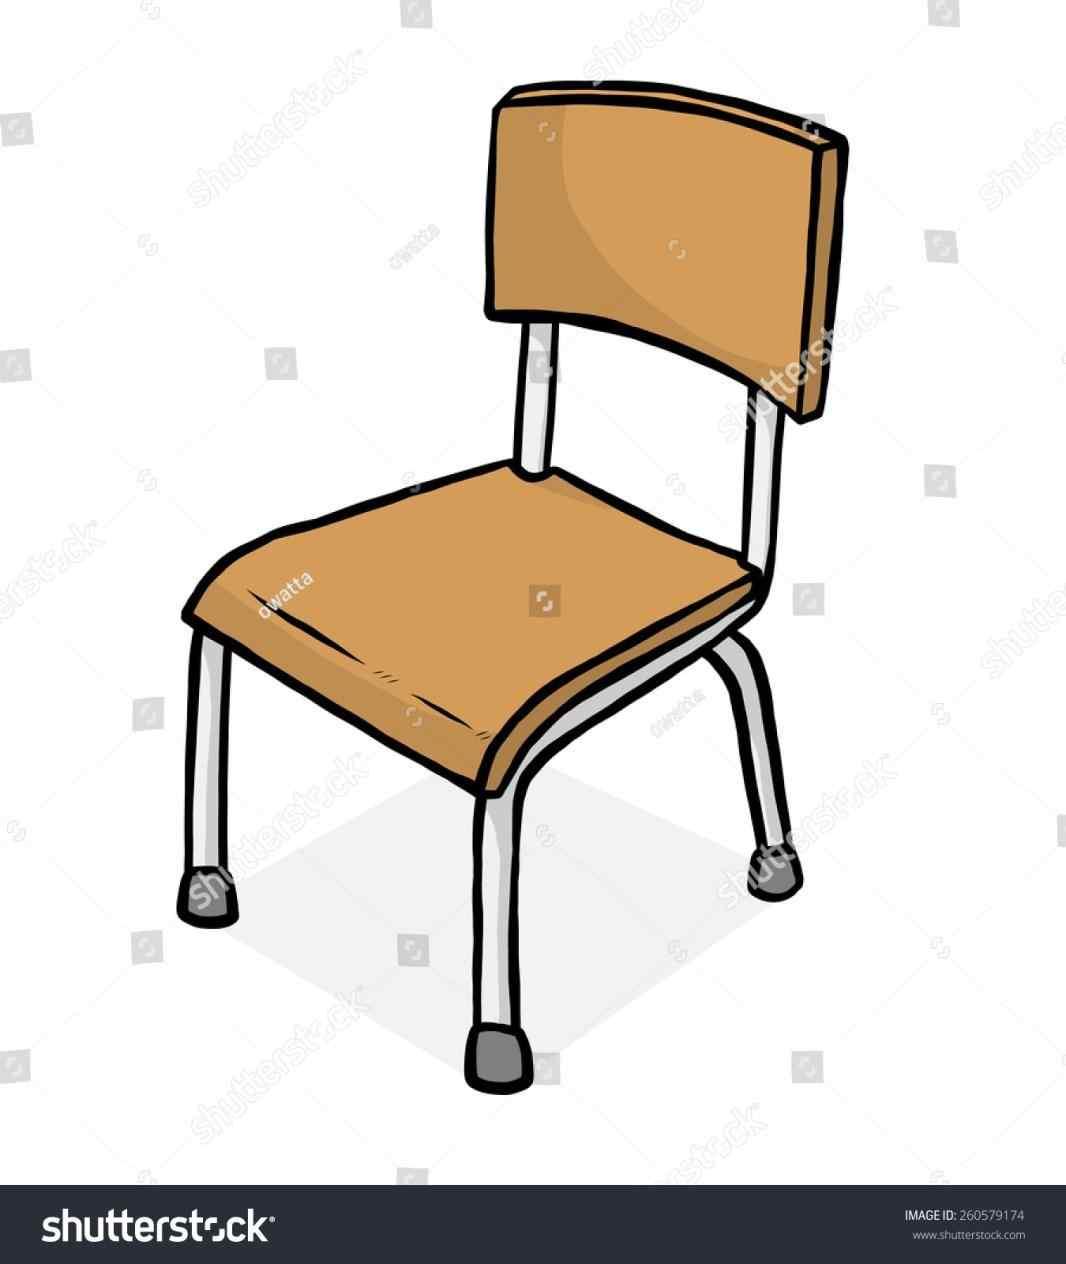 Chair clipart classroom chair, Chair classroom chair